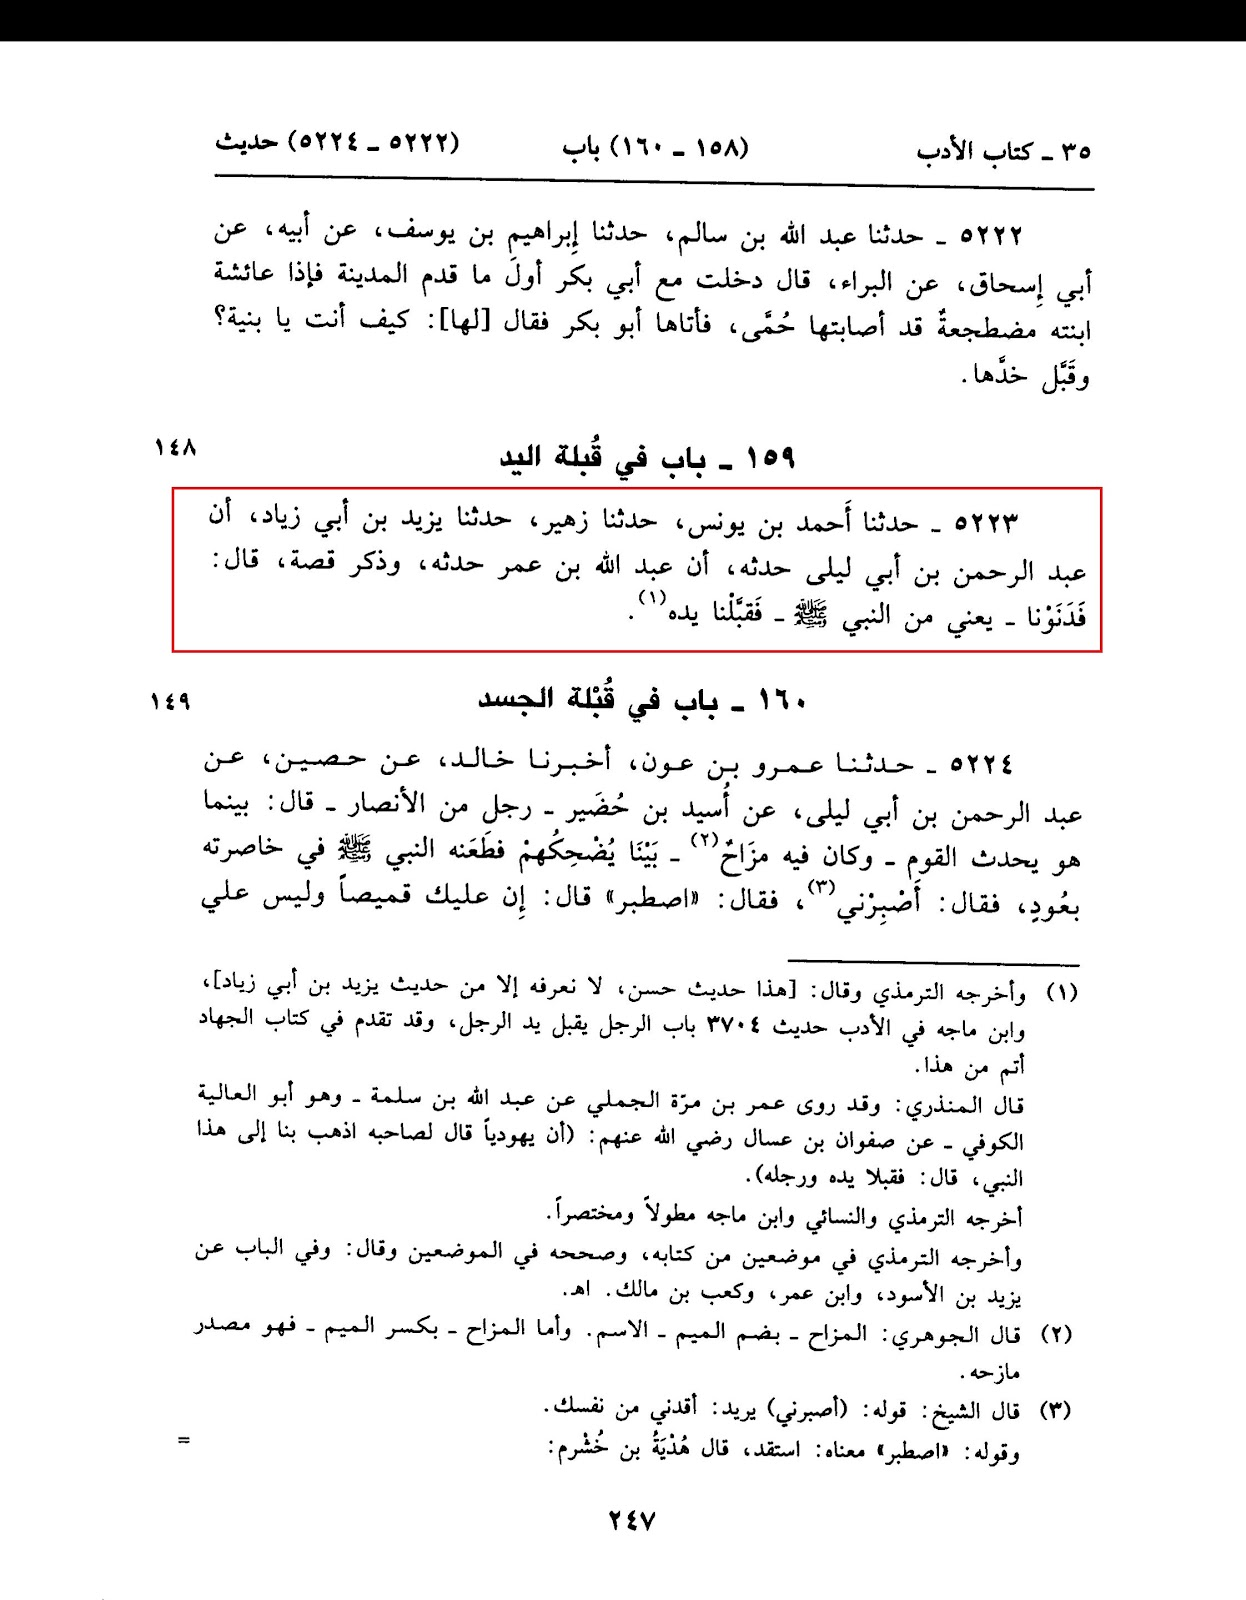 6b6954a10 Lies of Wahbi,Salafi,Deobandi on Imam Ahmed Raza Khan & Mawlid Date ...